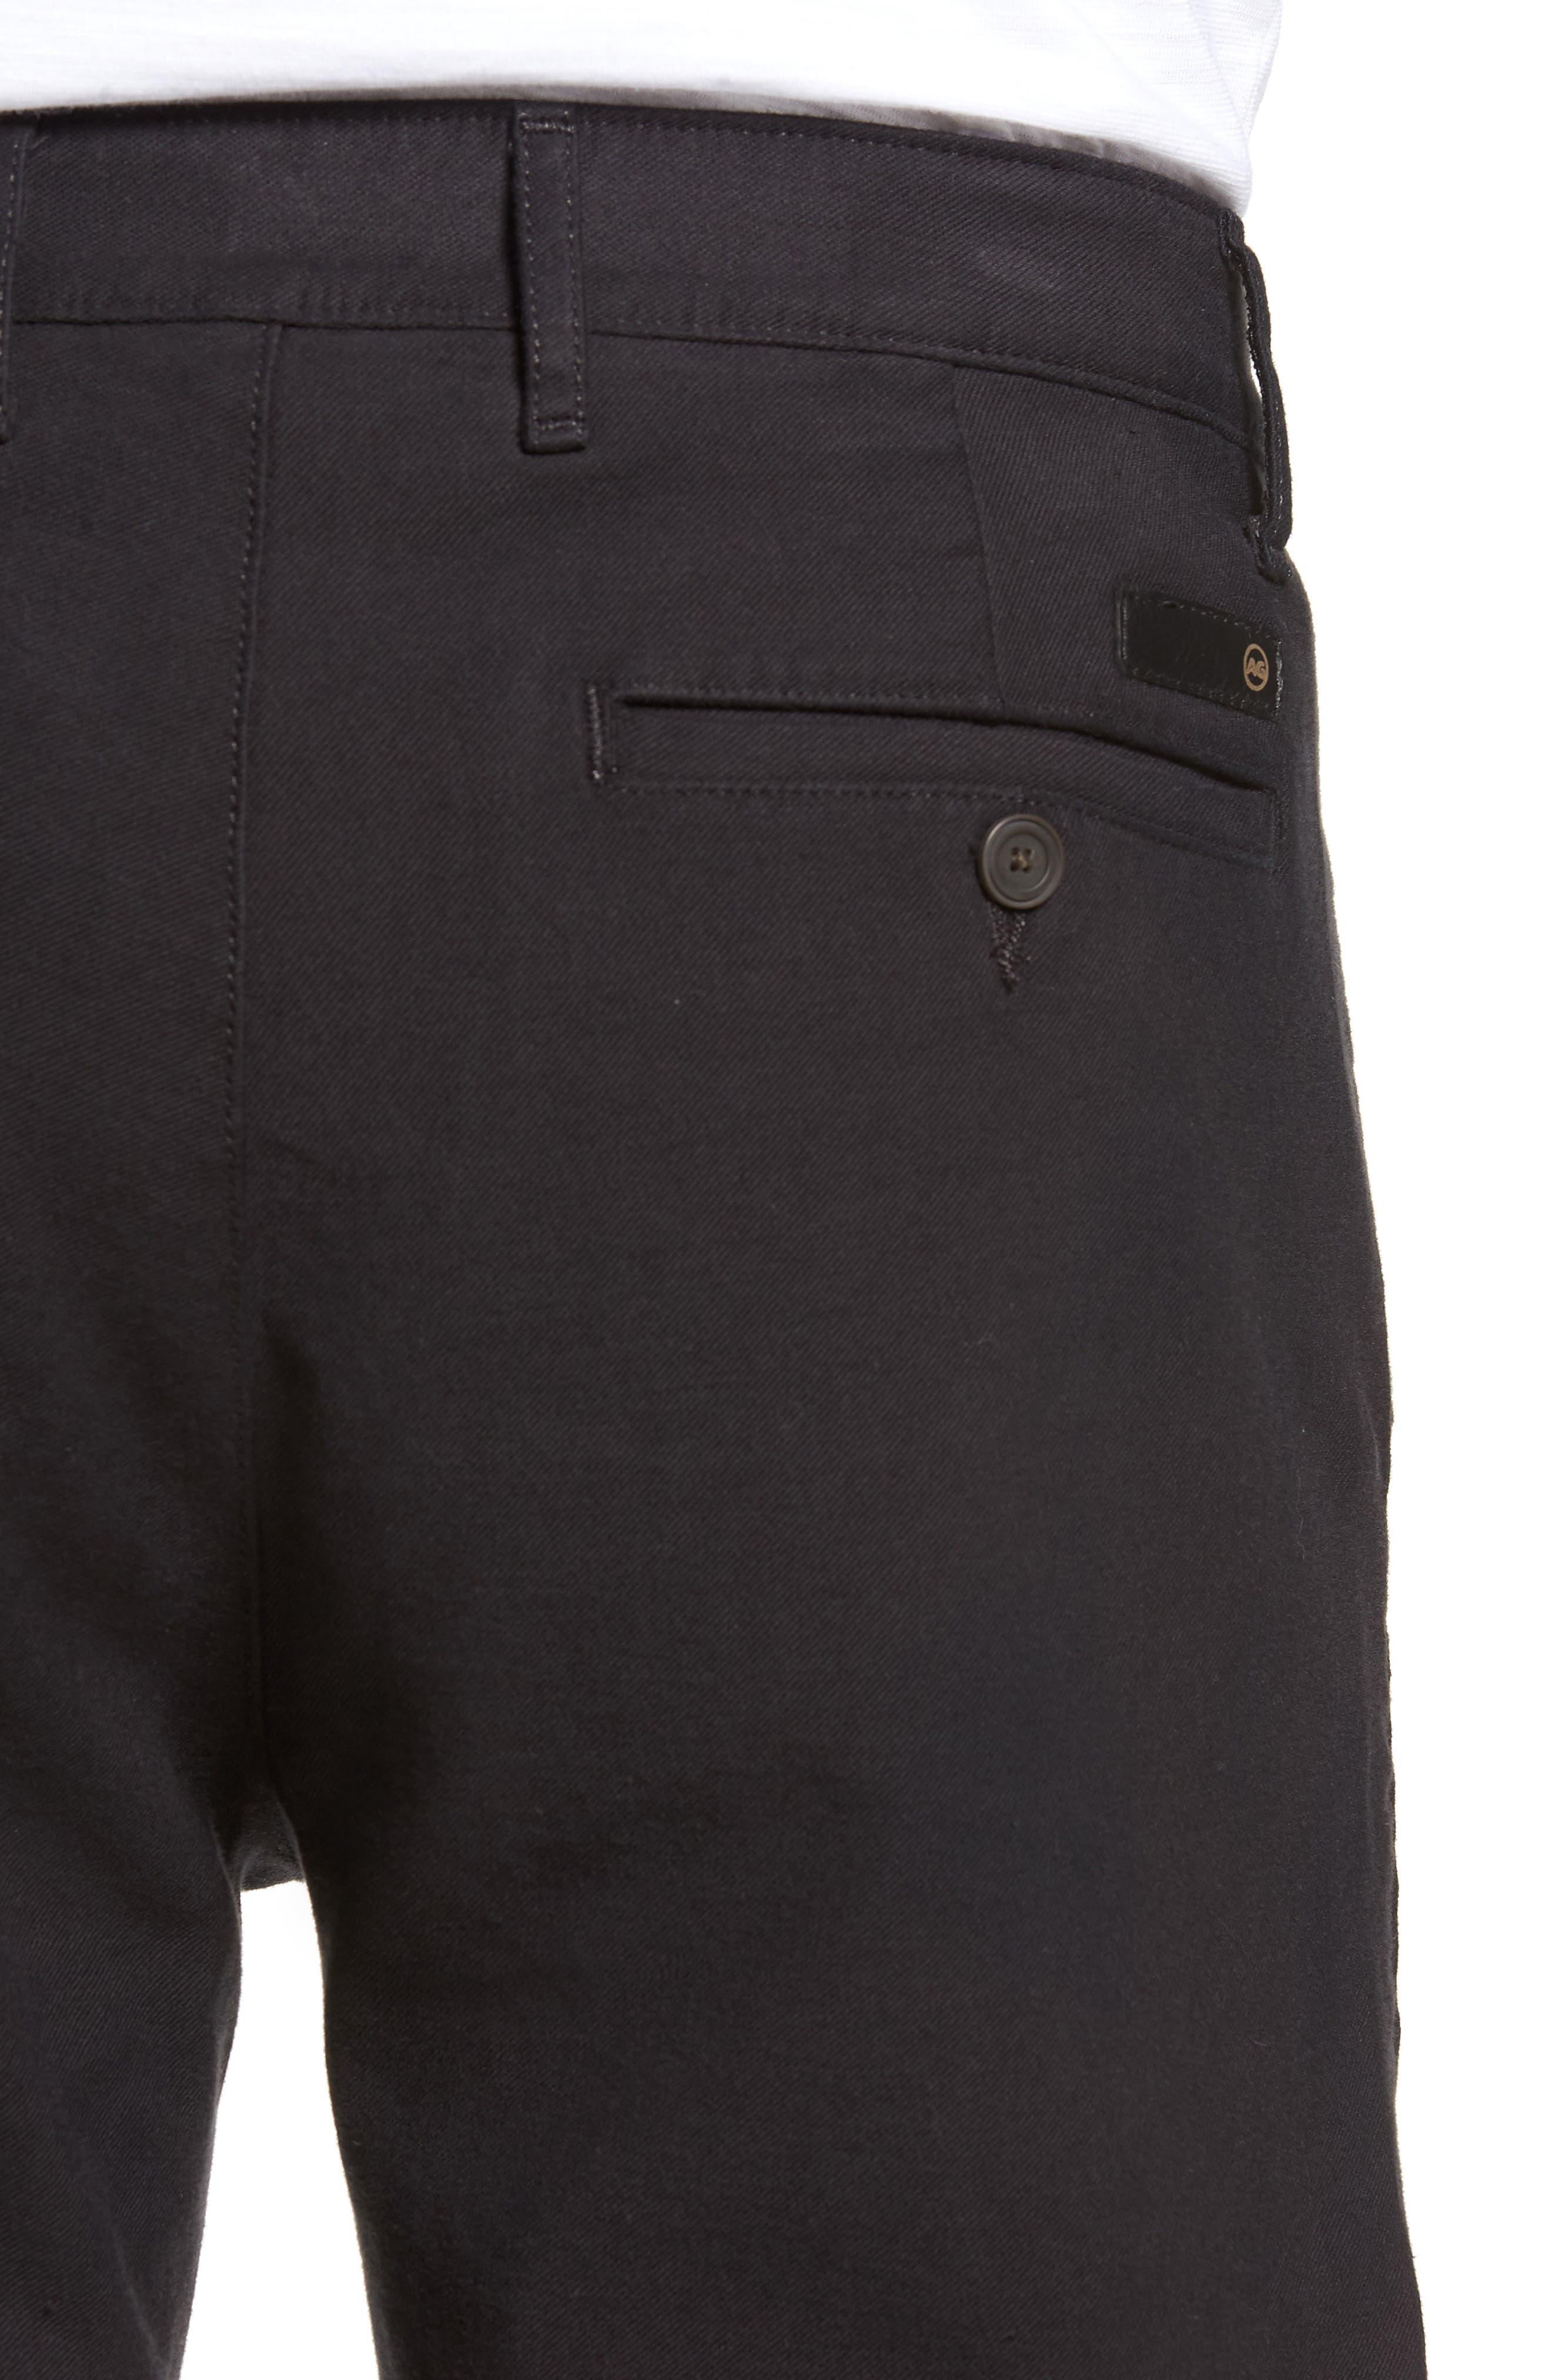 Marshall Slim Fit Chino Pants,                             Alternate thumbnail 4, color,                             GREY STONE